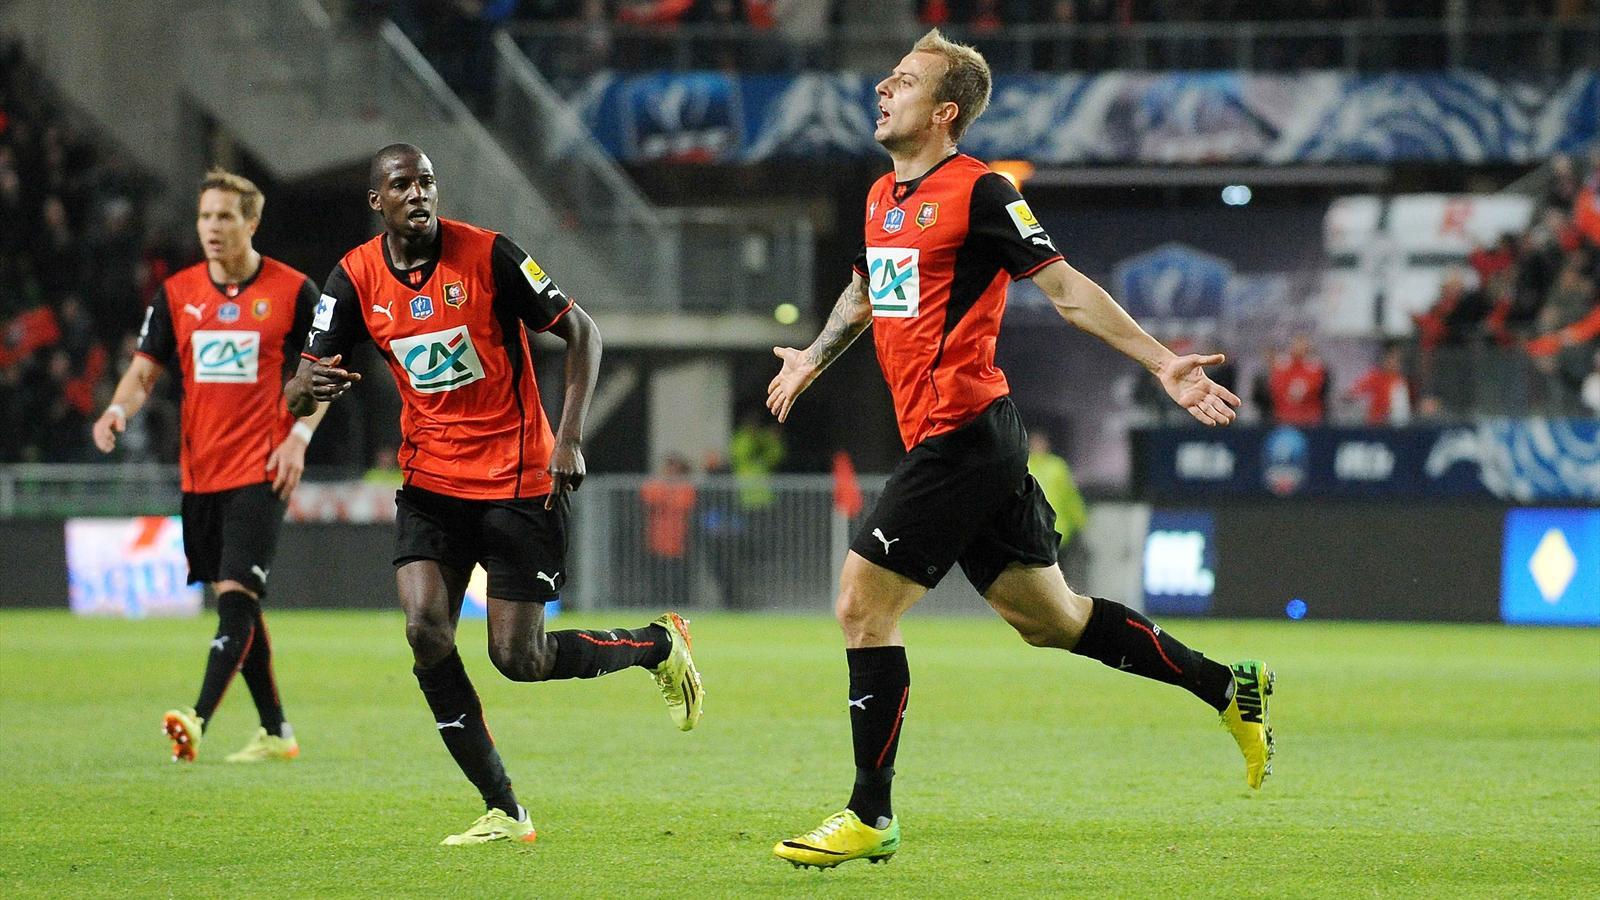 Match Stade Rennais vs FC Lorient en direct live streaming